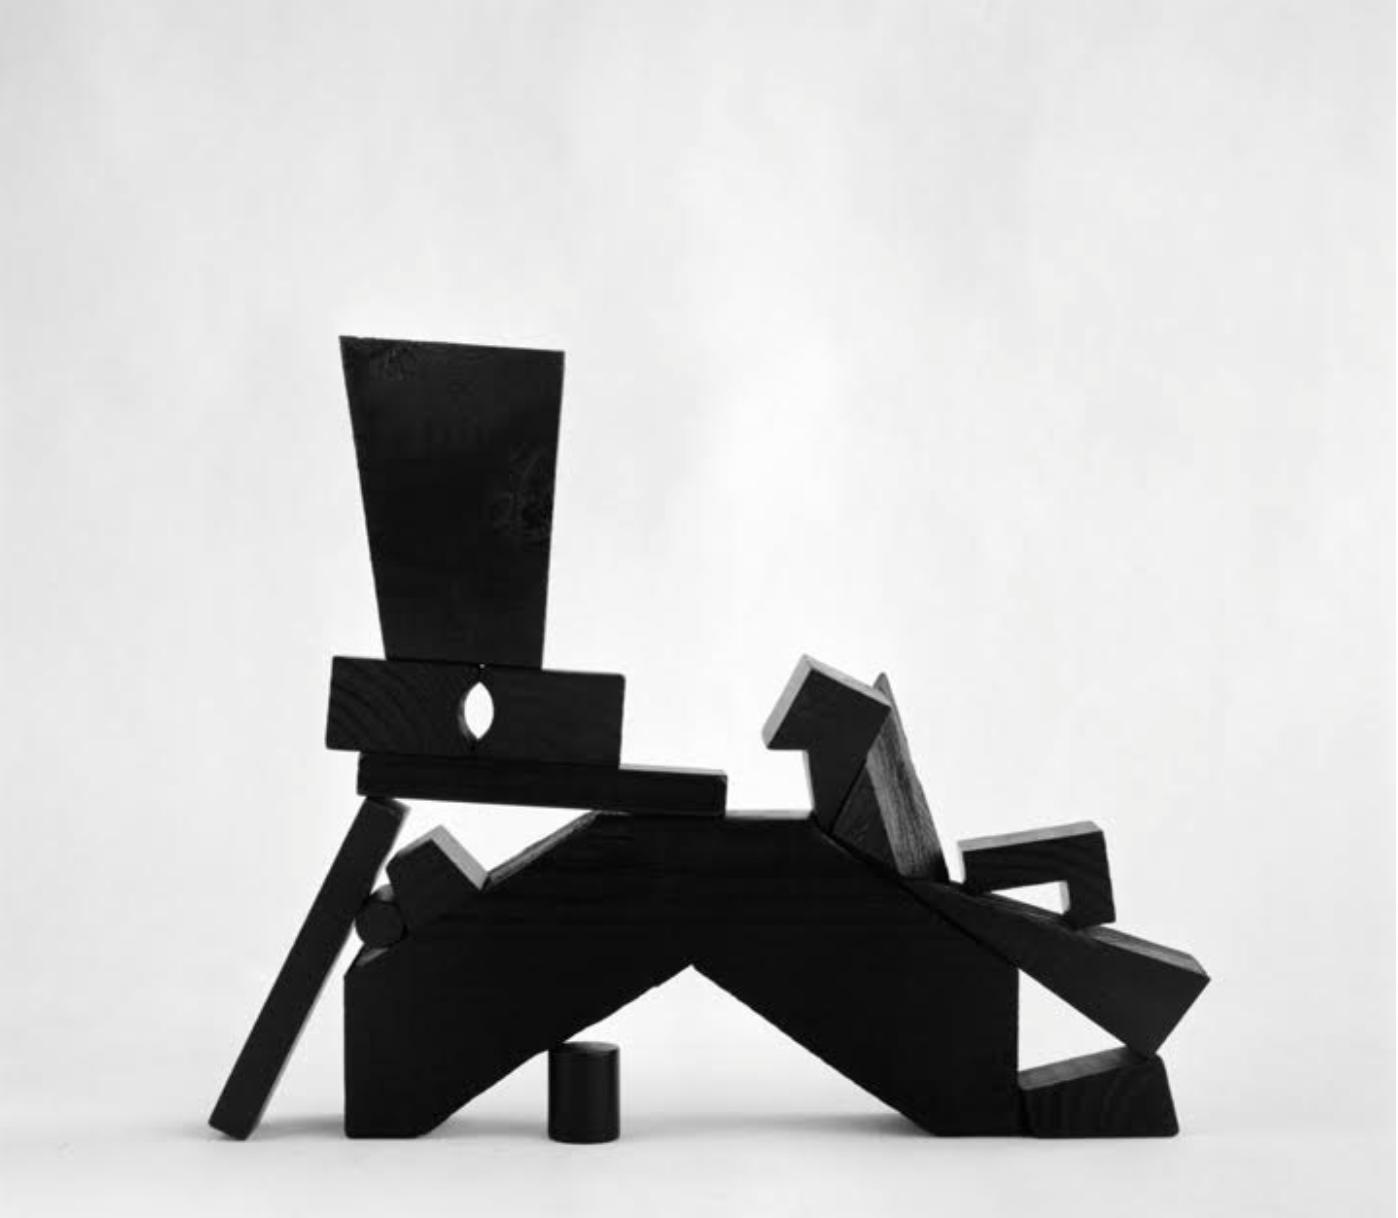 R Blair Sullivan, Untitled, C-Print, 2008